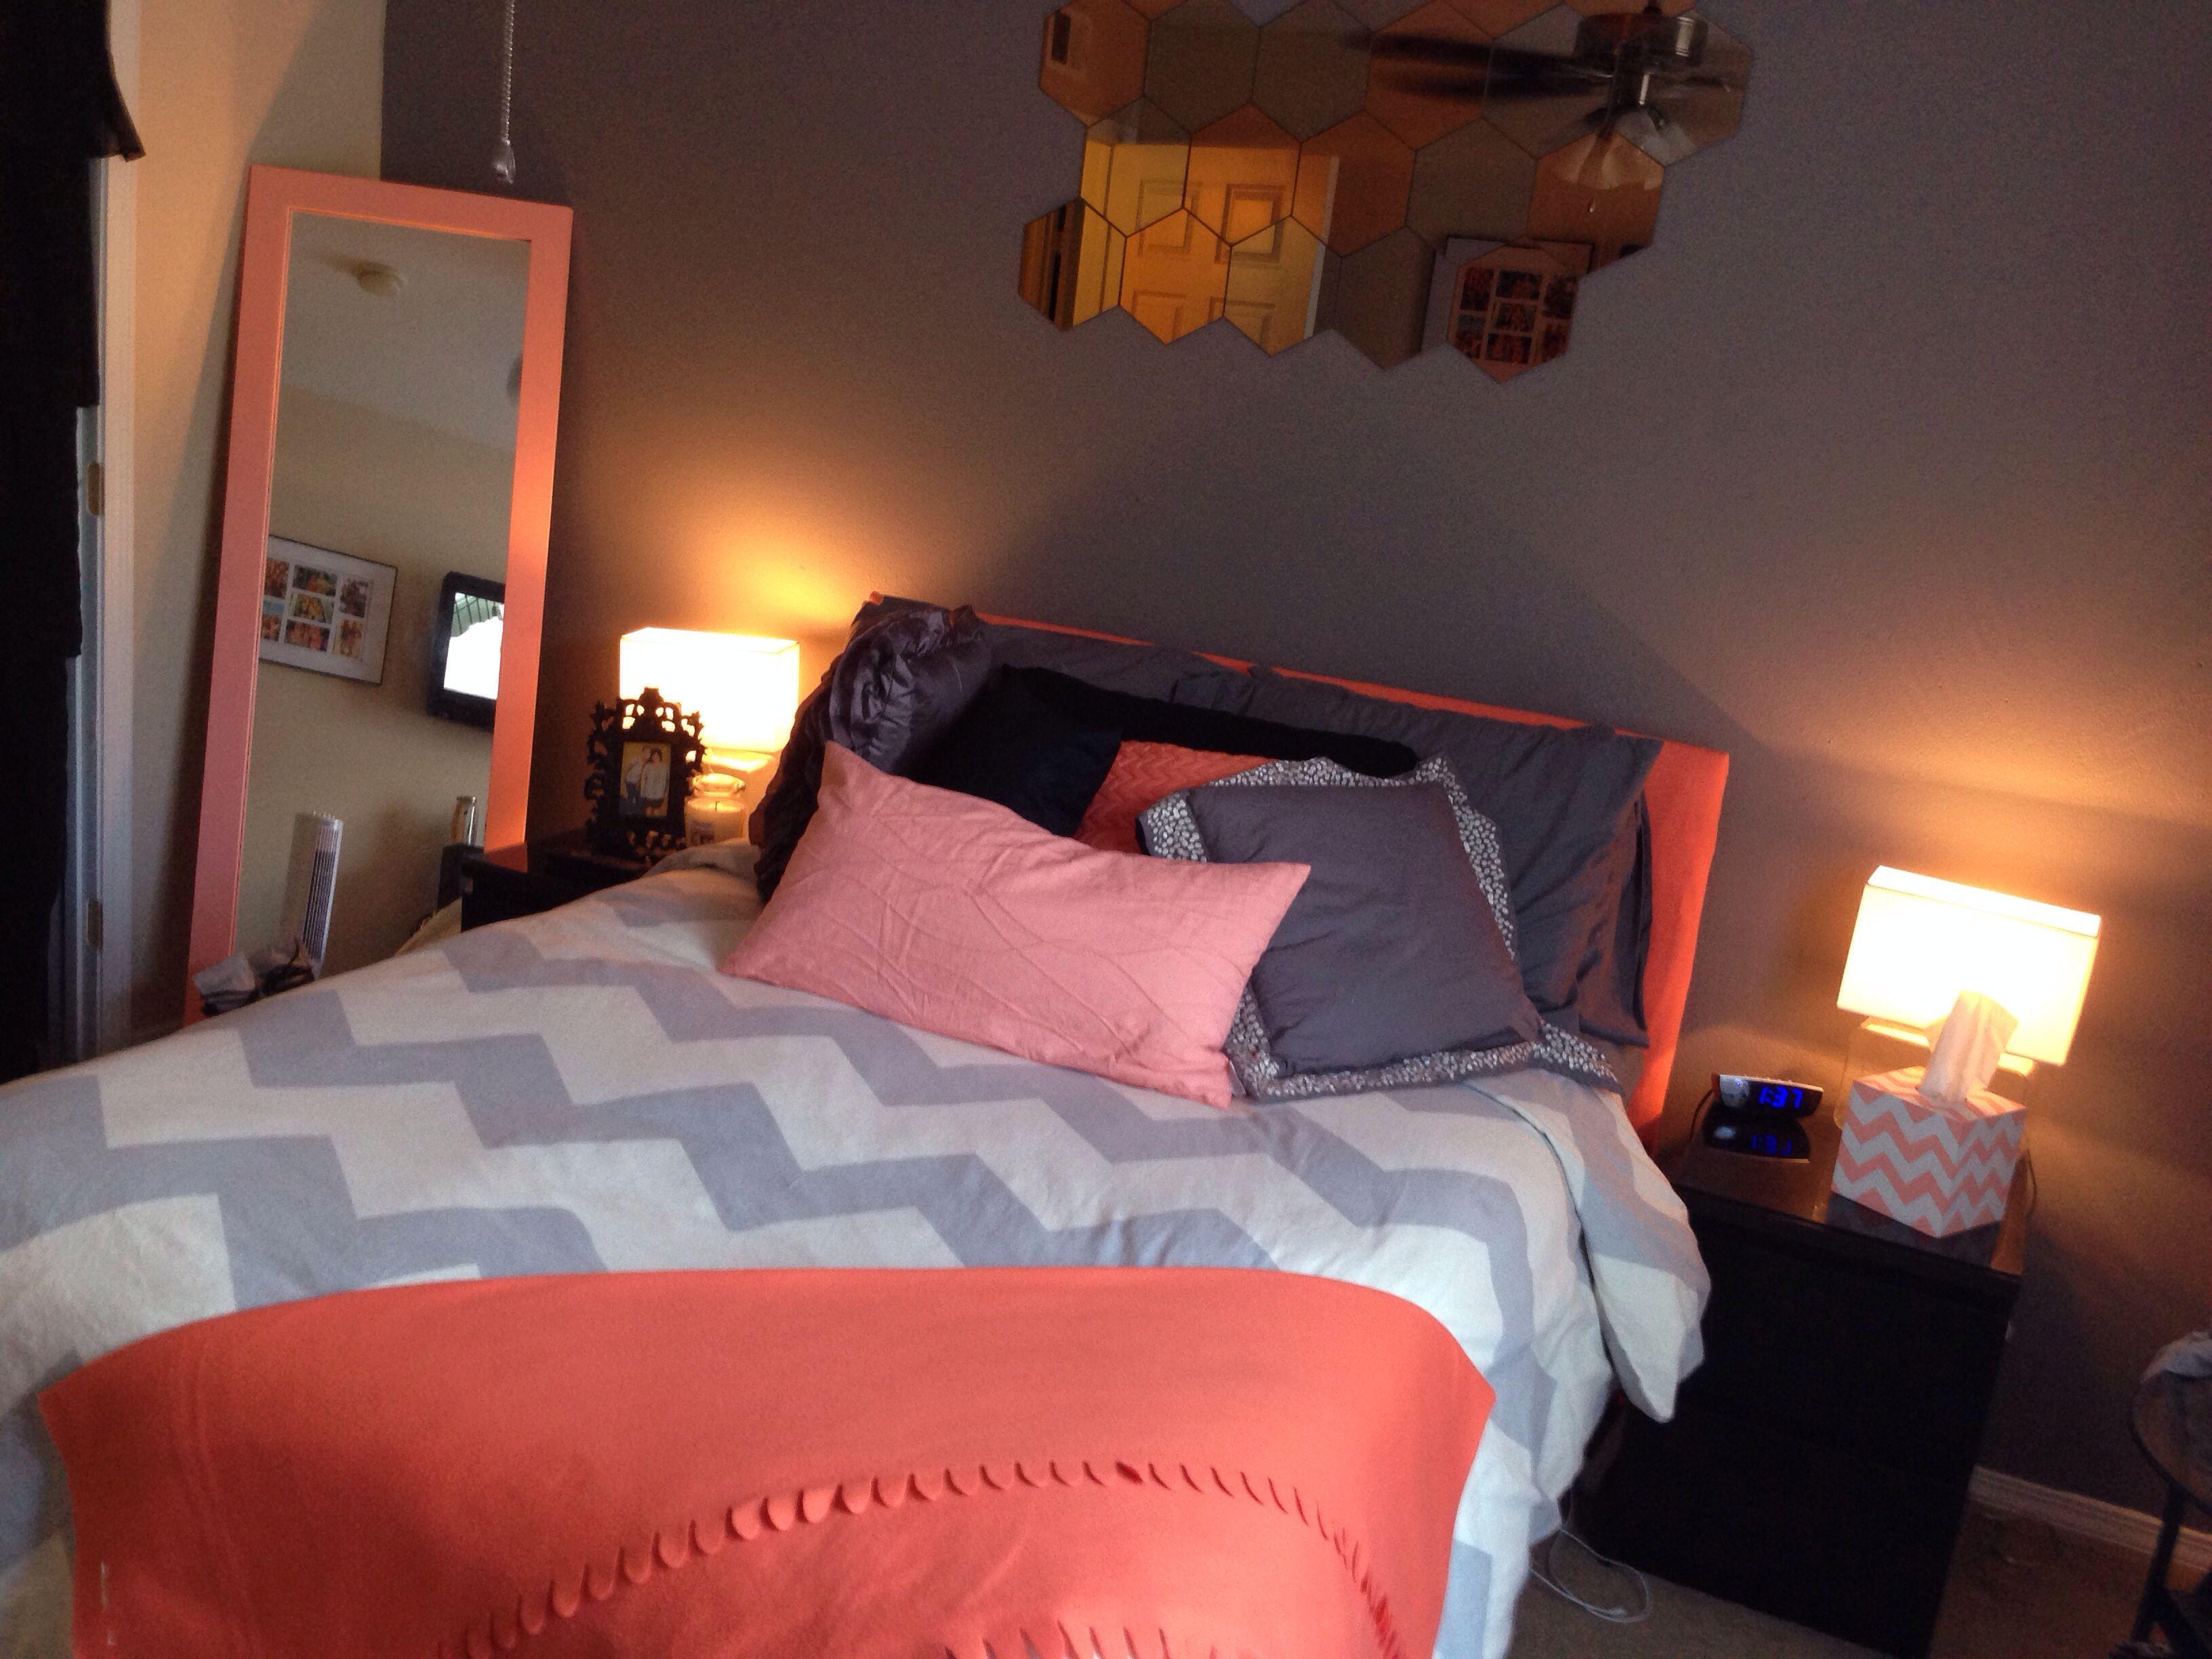 Coral/Peach & grey chevron bedroom | My Pins | Pinterest | Grey ...